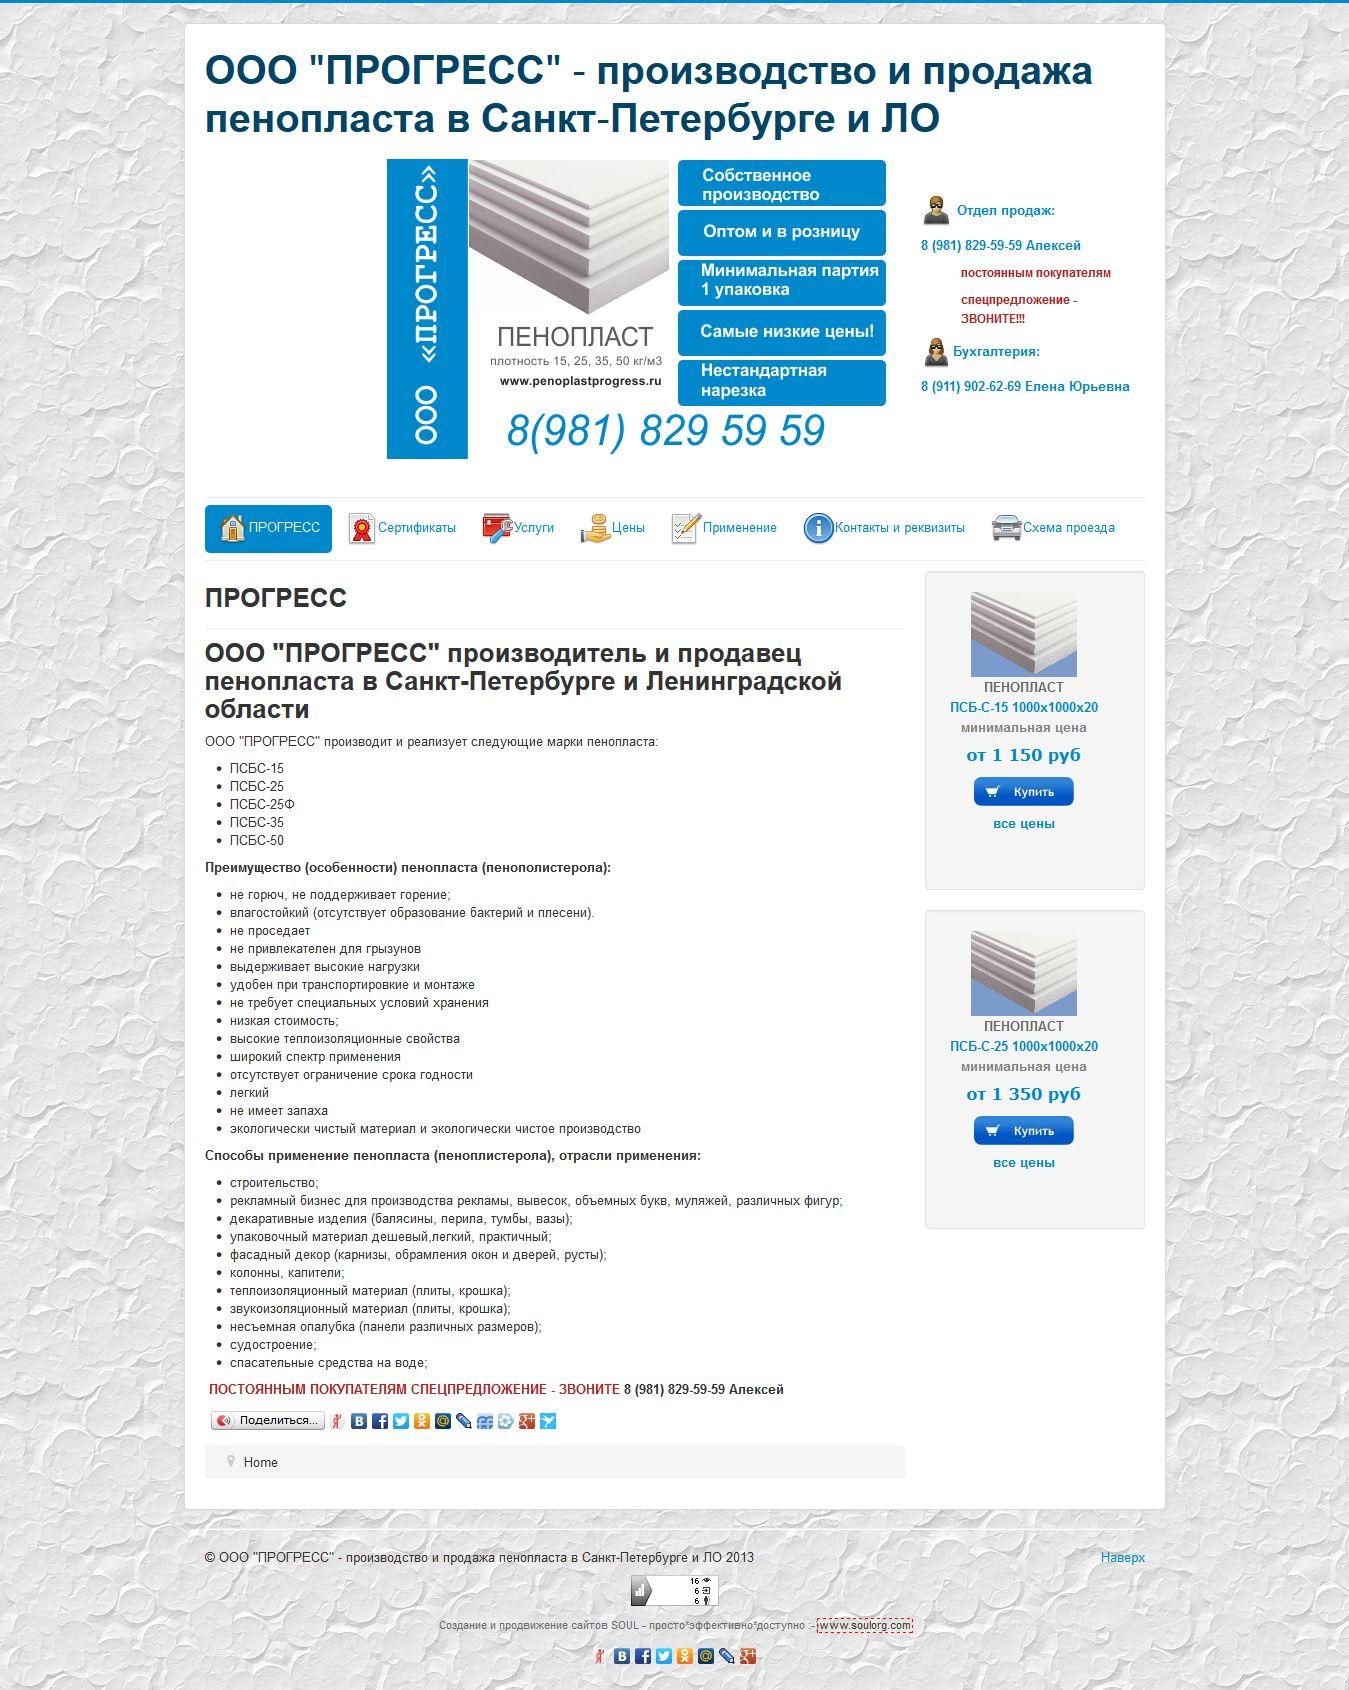 Сайт-визитка на Joomla 3.0. Производство пенопласта.